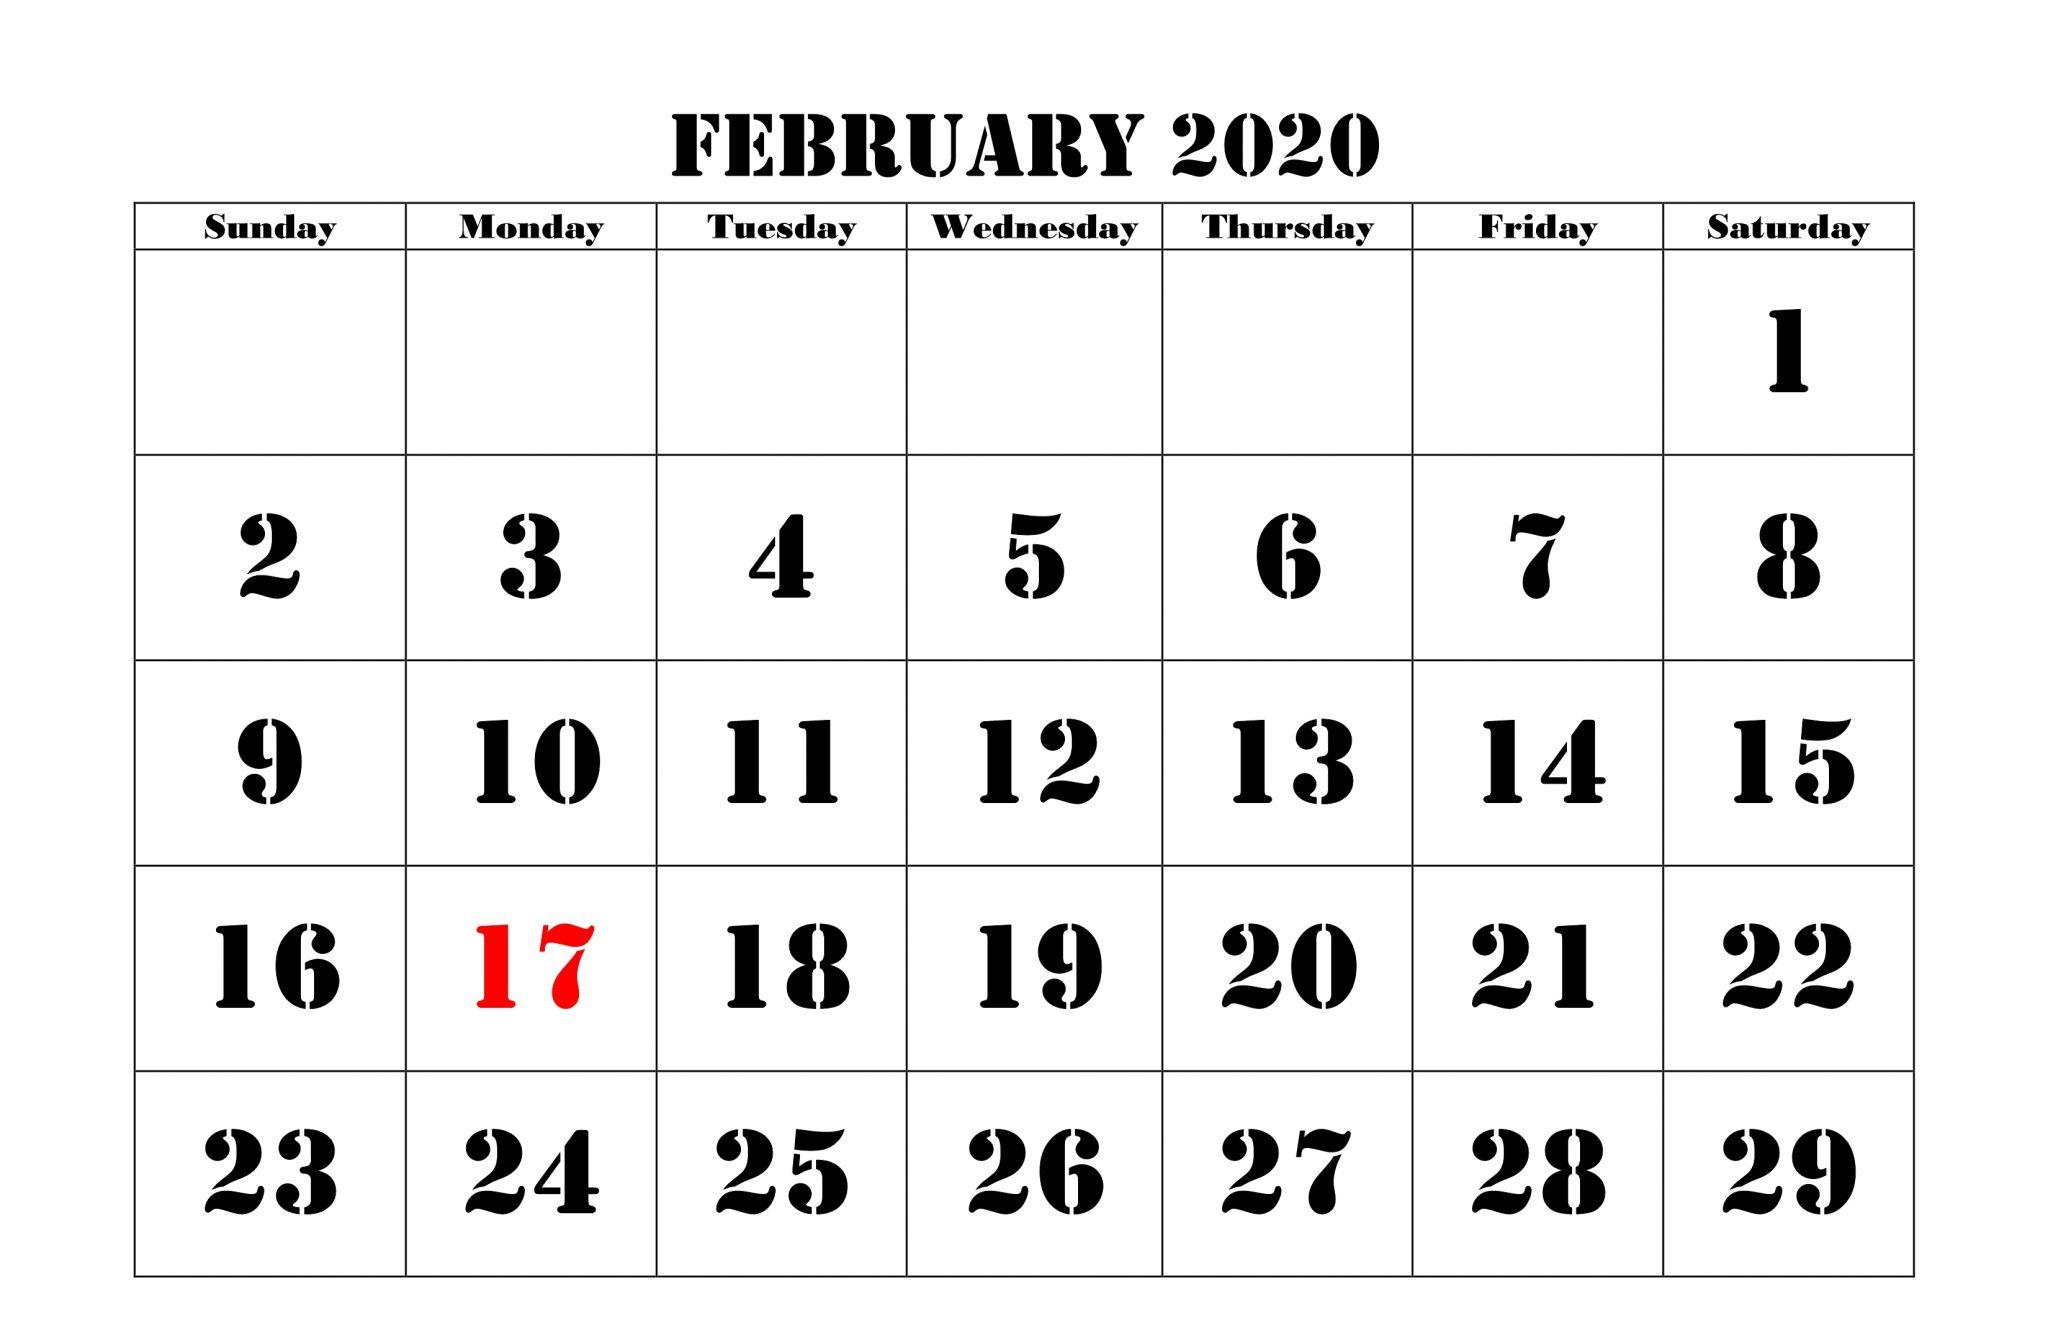 February 2020 Calendar Blank Template